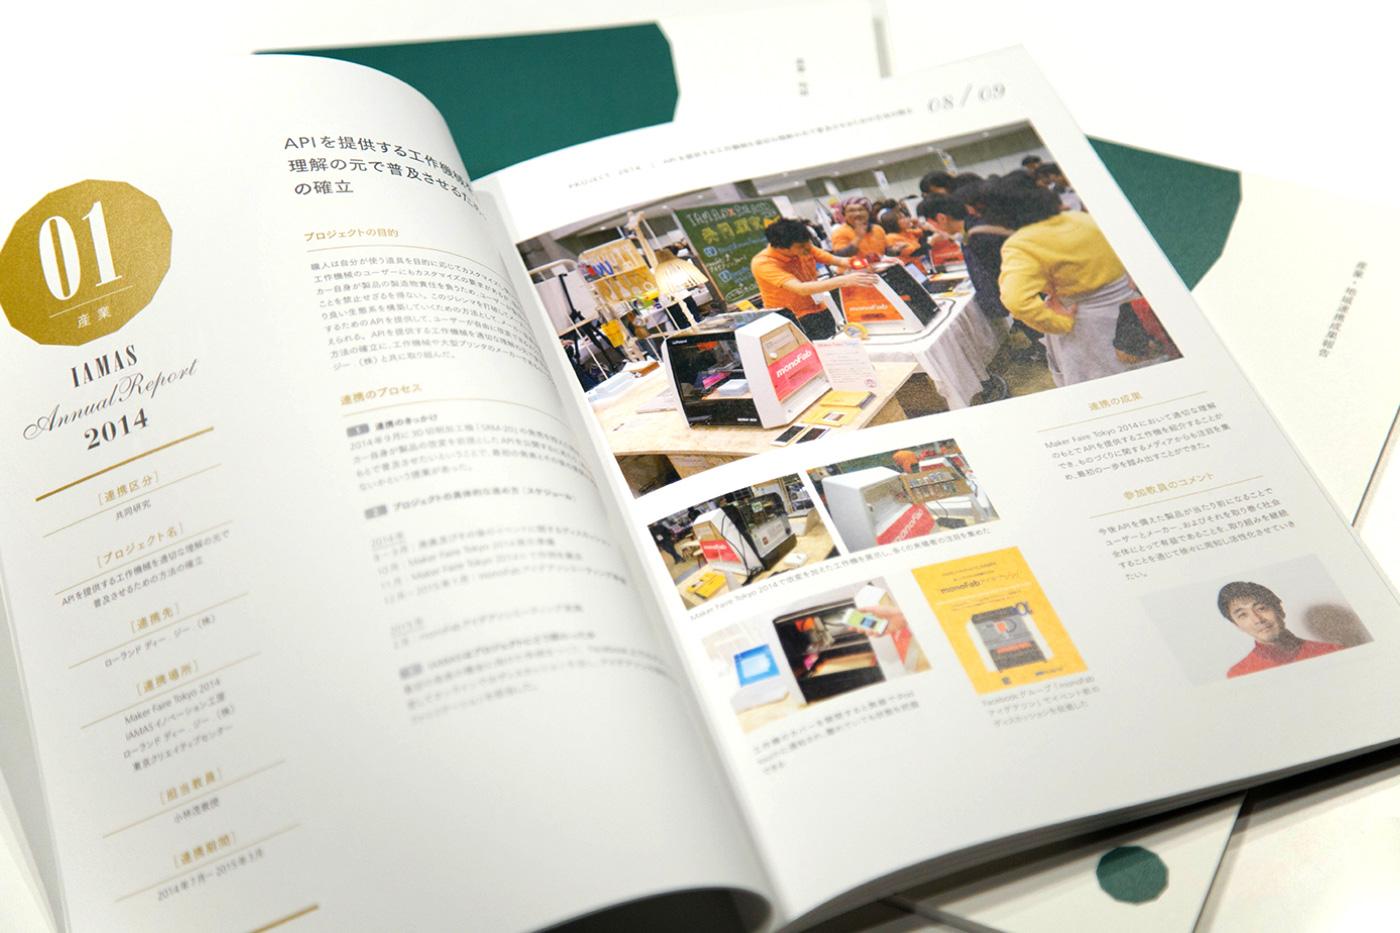 IAMAS Annual Report 2014 産業・地域連携成果報告イメージ